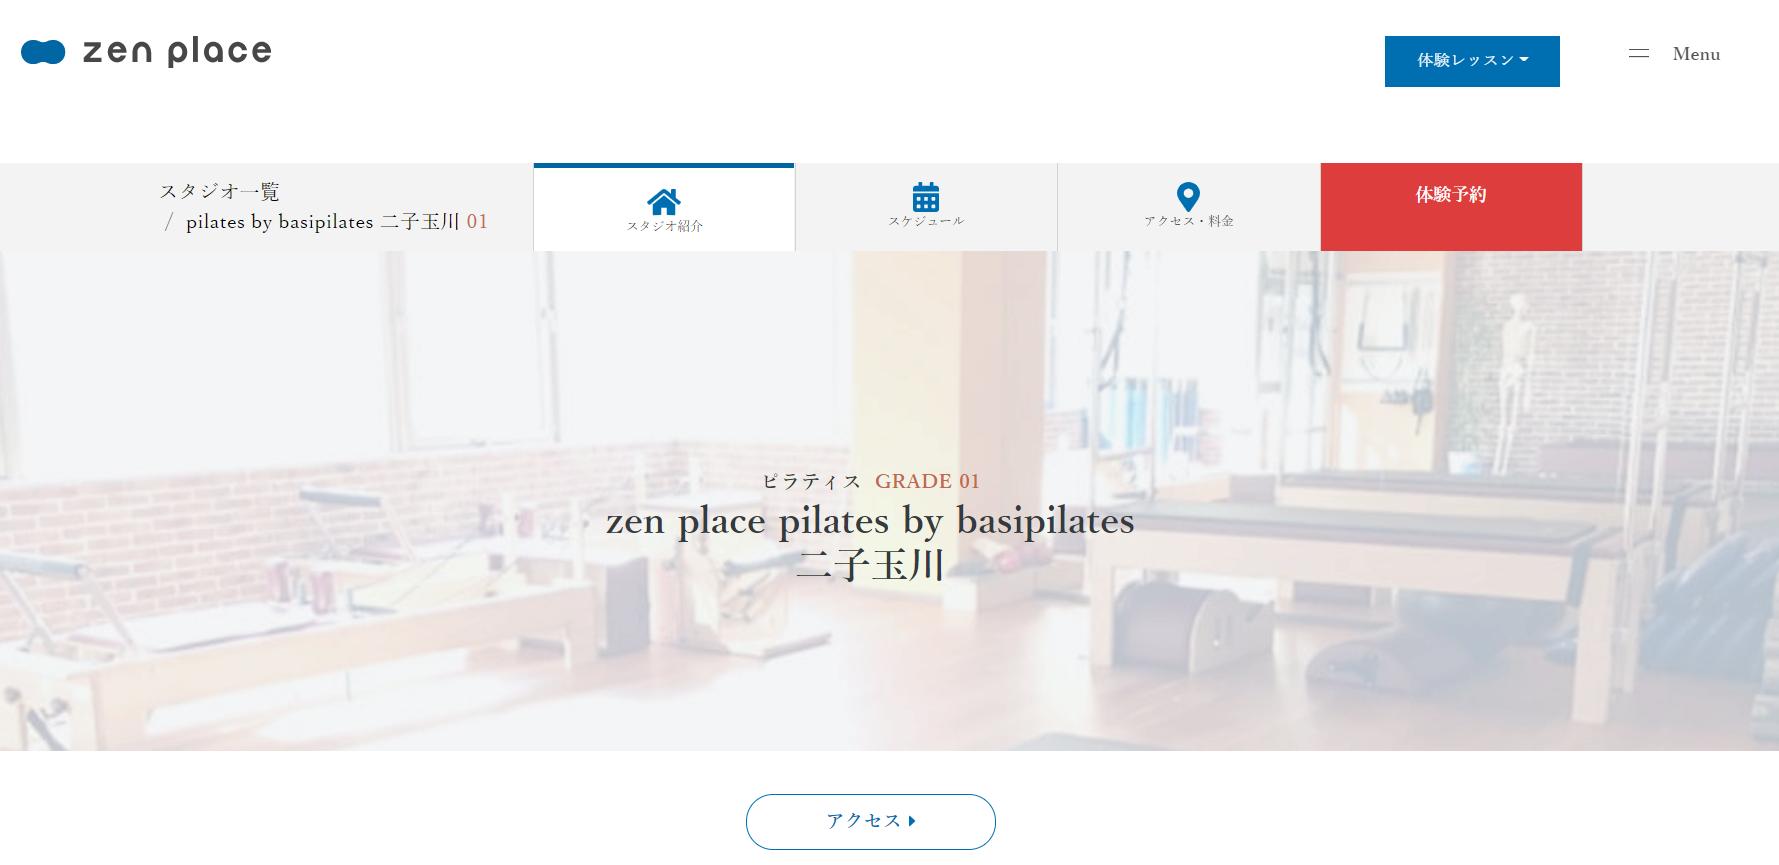 zen place pilates by basipilates二子玉川